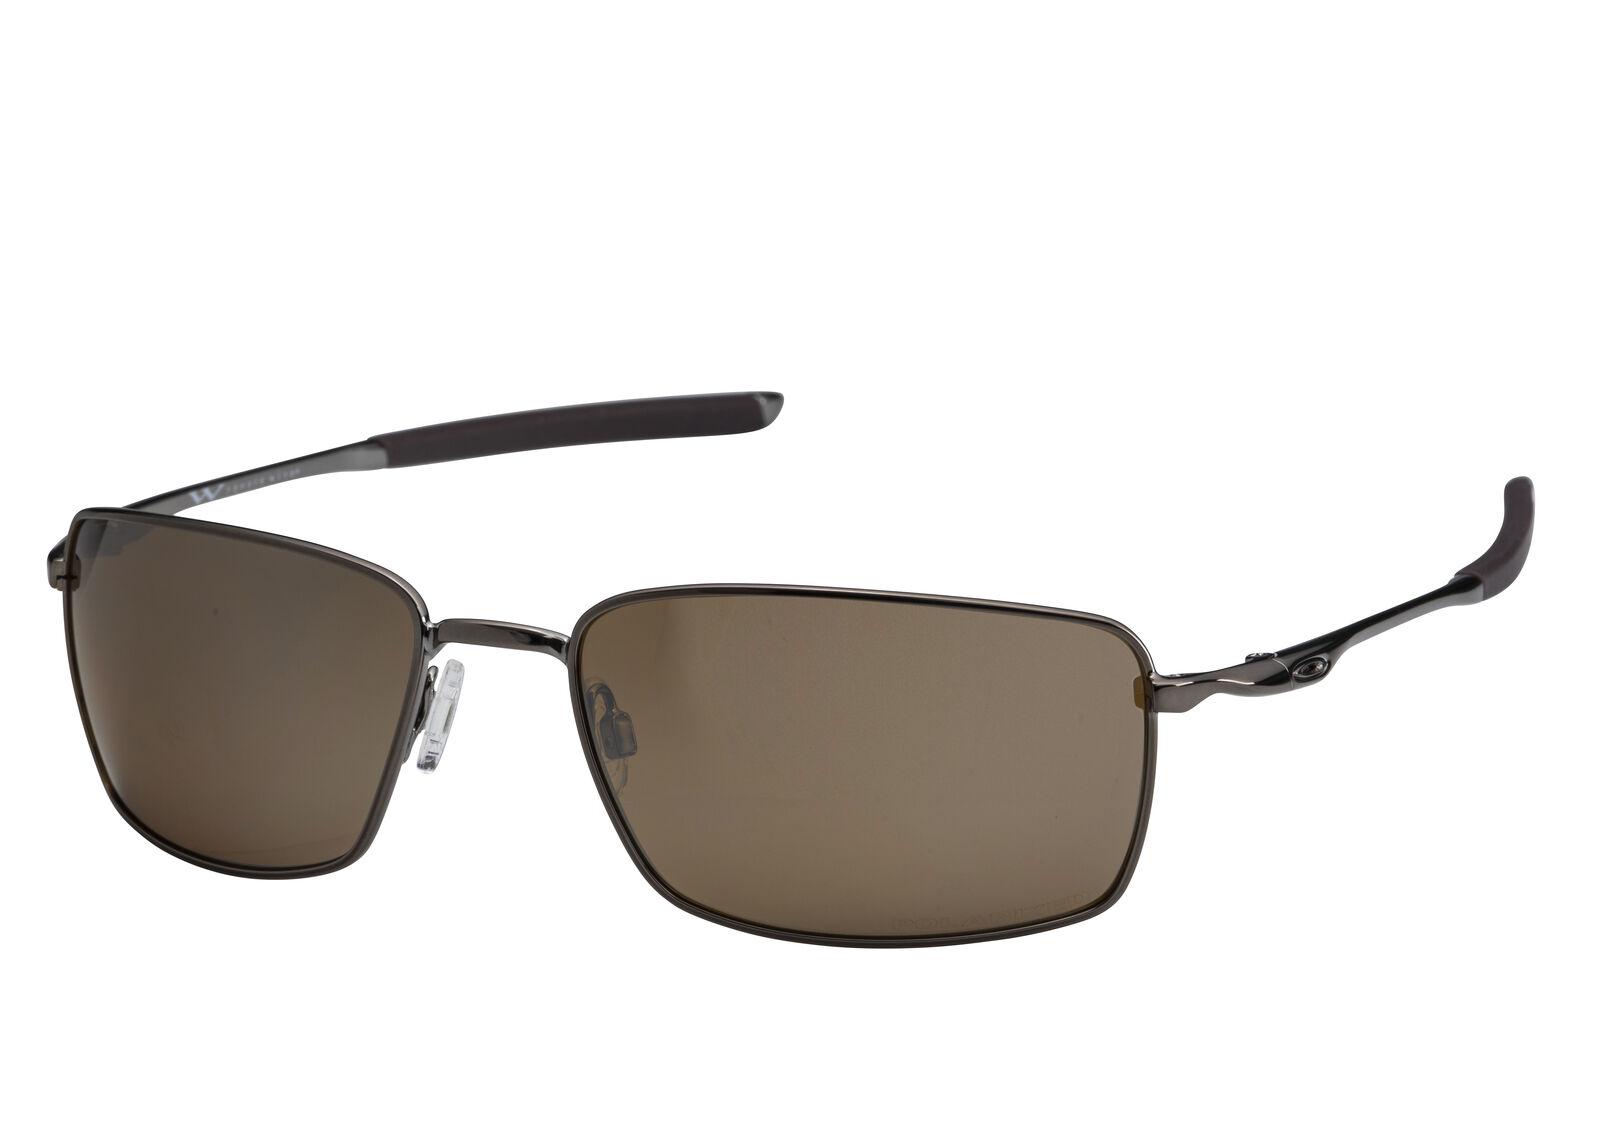 e639500454 Details about Oakley Square Wire Sunglasses OO4075-06 Tungsten Iridium  Polarized OO4075 06